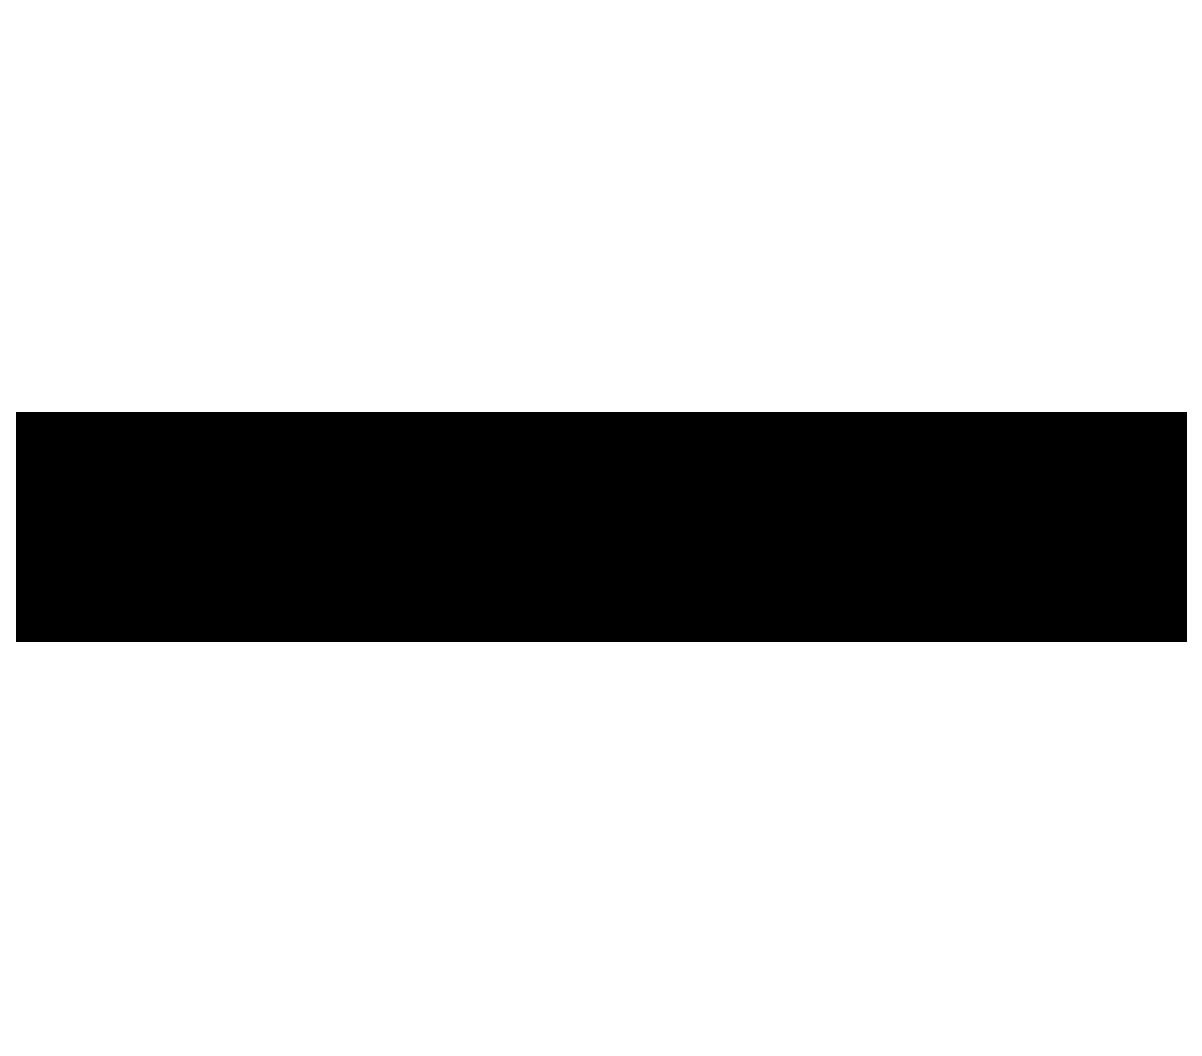 Entrepreneur_logo_70.png